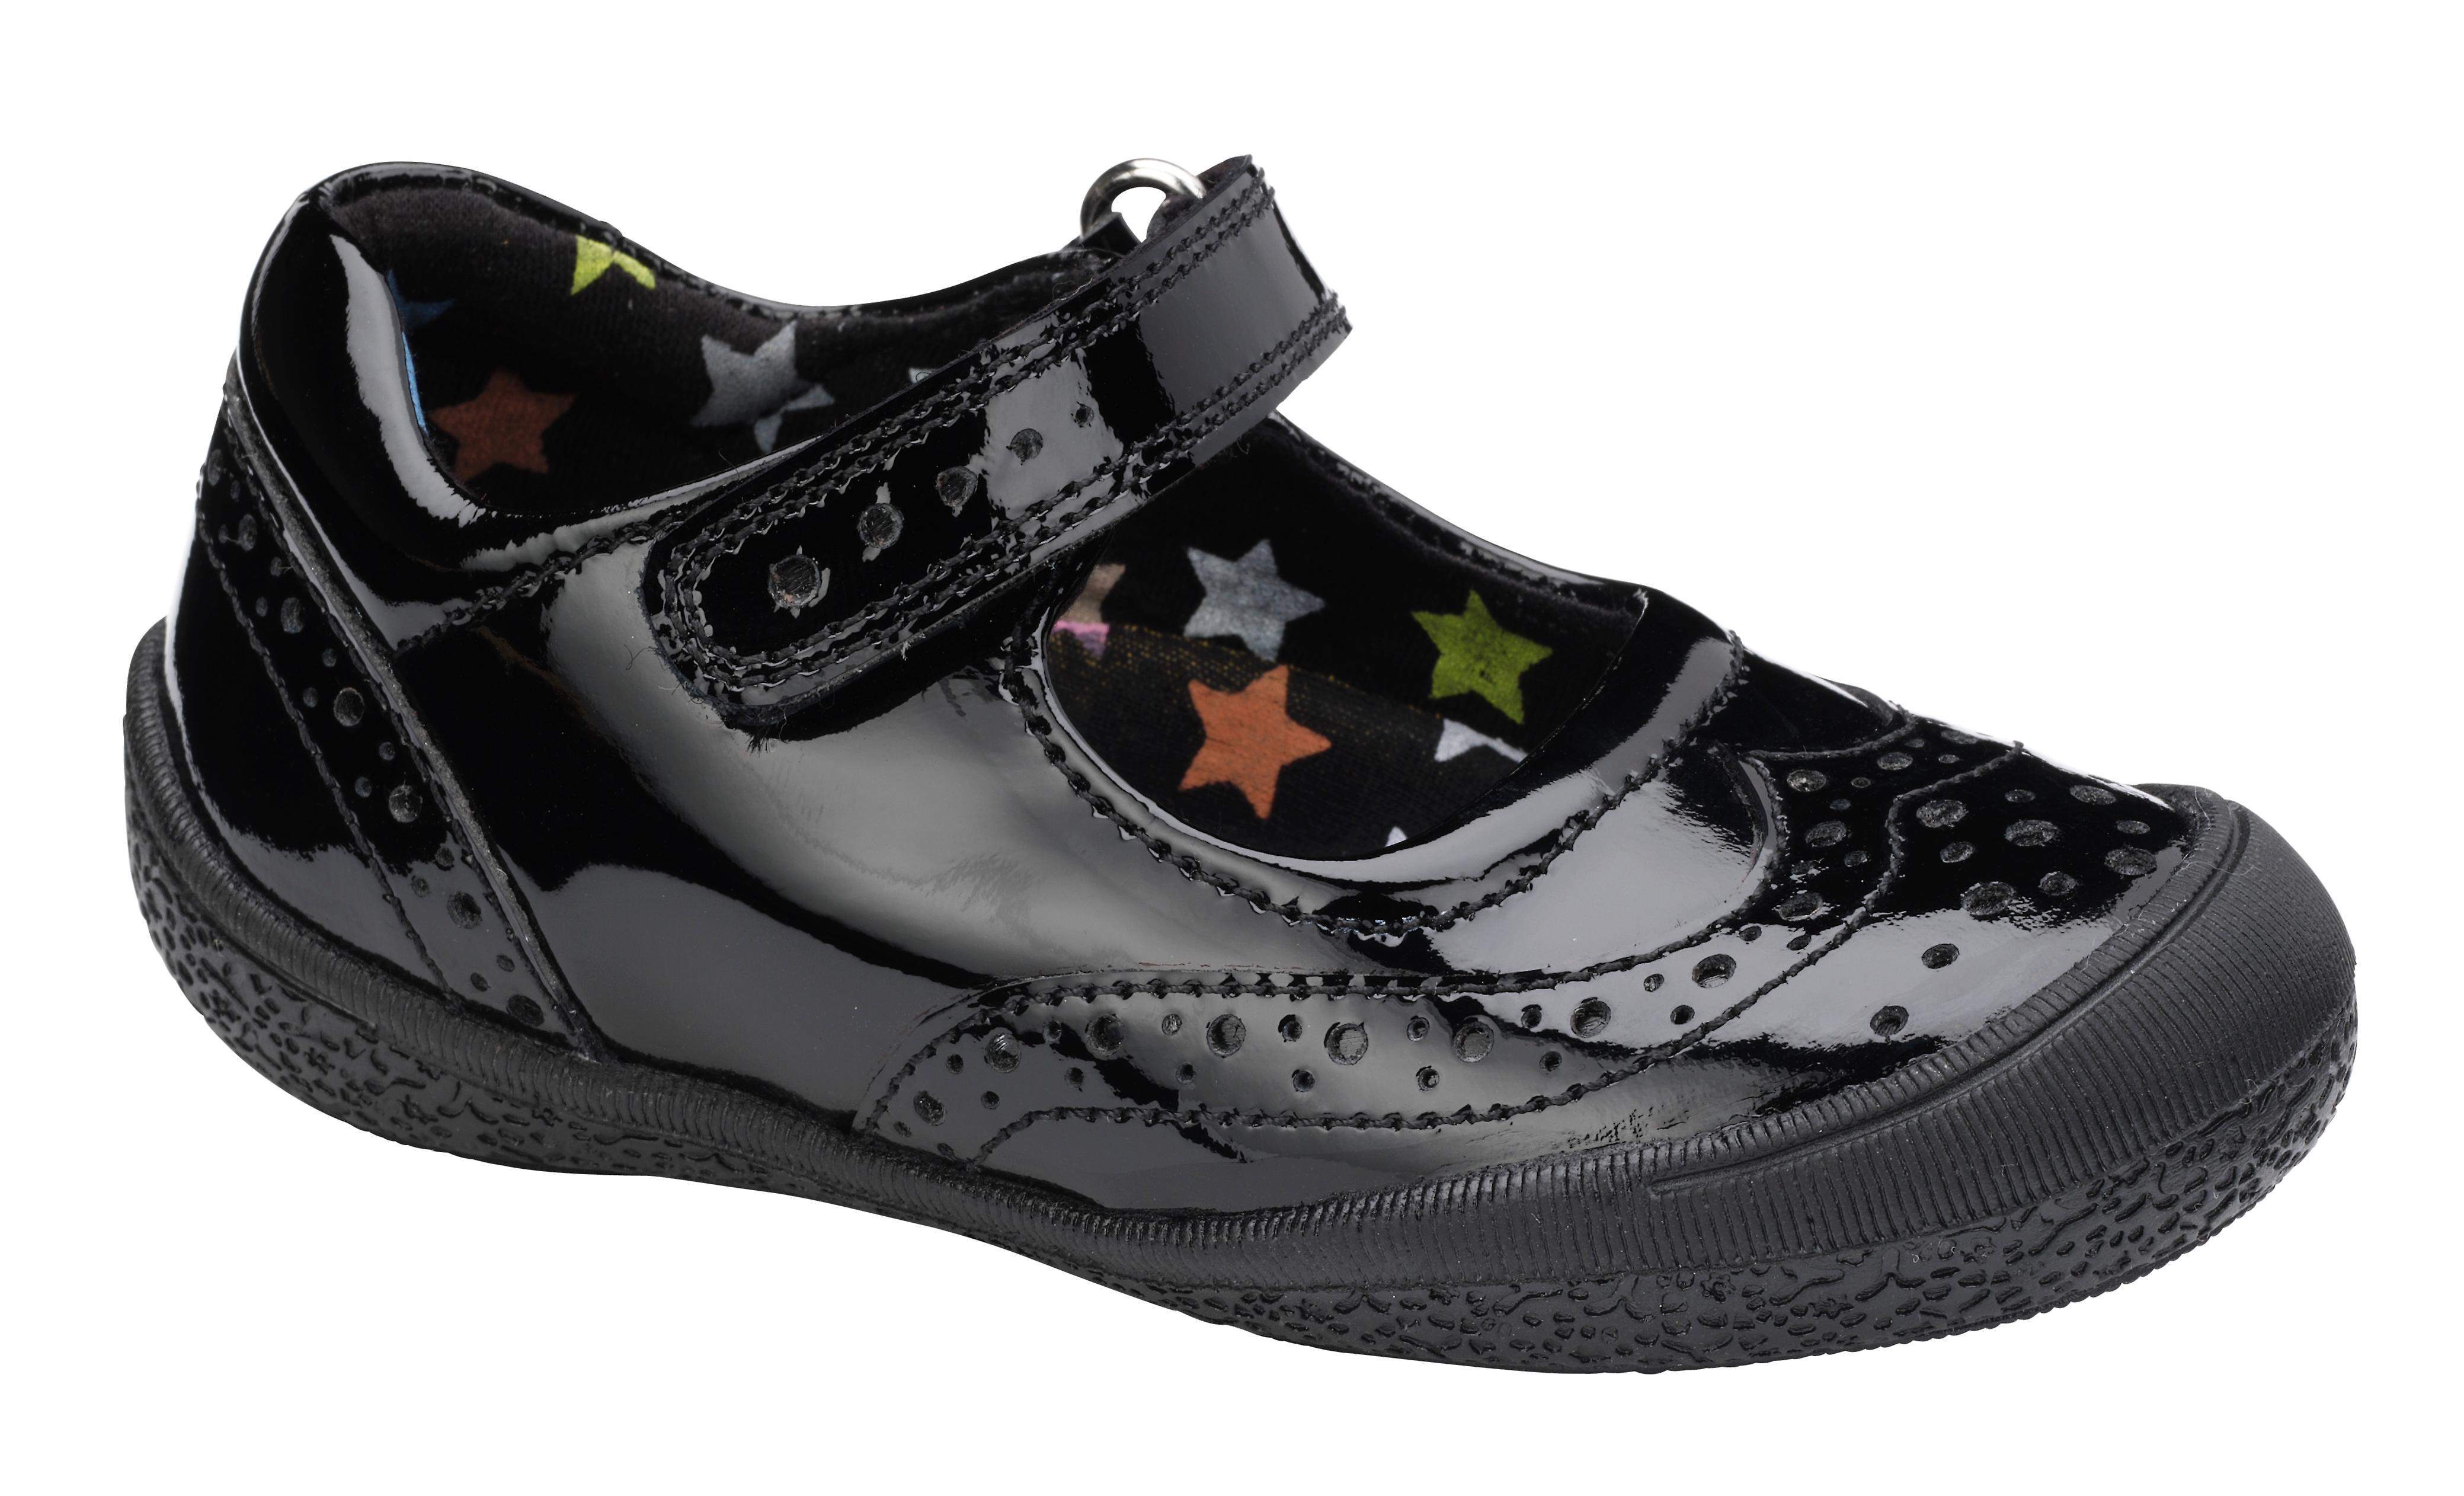 Hush Puppies Girls Rina School chaussures noir Patent F Fitting